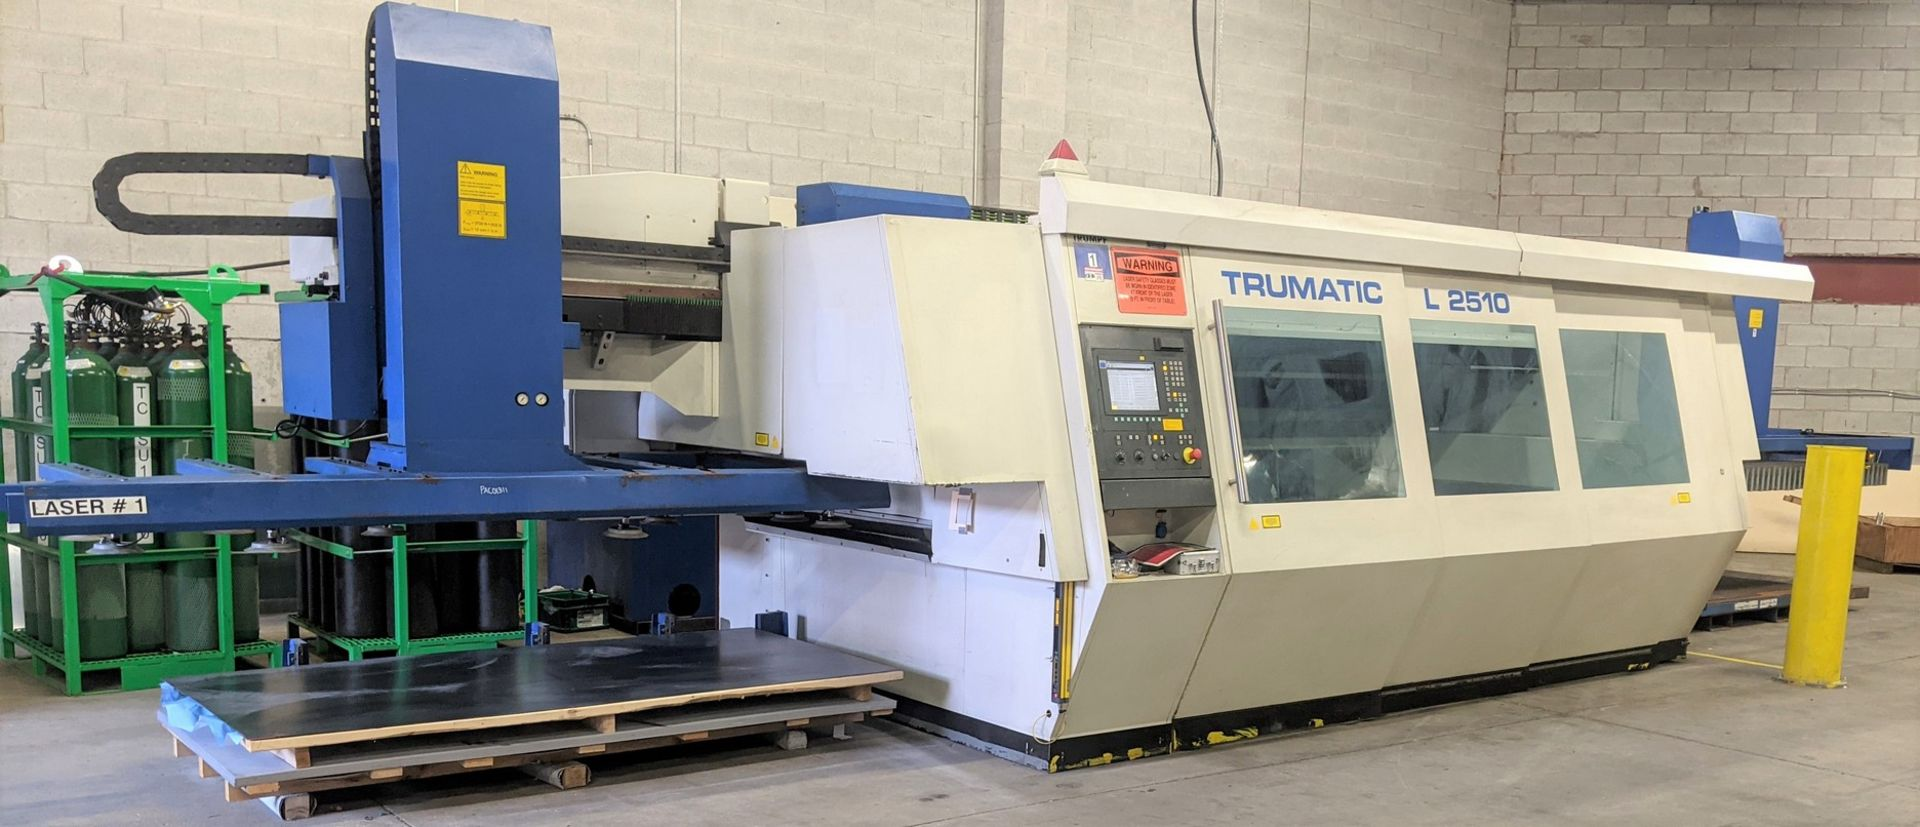 "2006 TRUMPF TRUMATIC L 2510 CNC LASER, 2,000 WATT, 4' X 10' TABLE, TRAVELS: X-120"", Y-50"", Z- - Image 3 of 32"